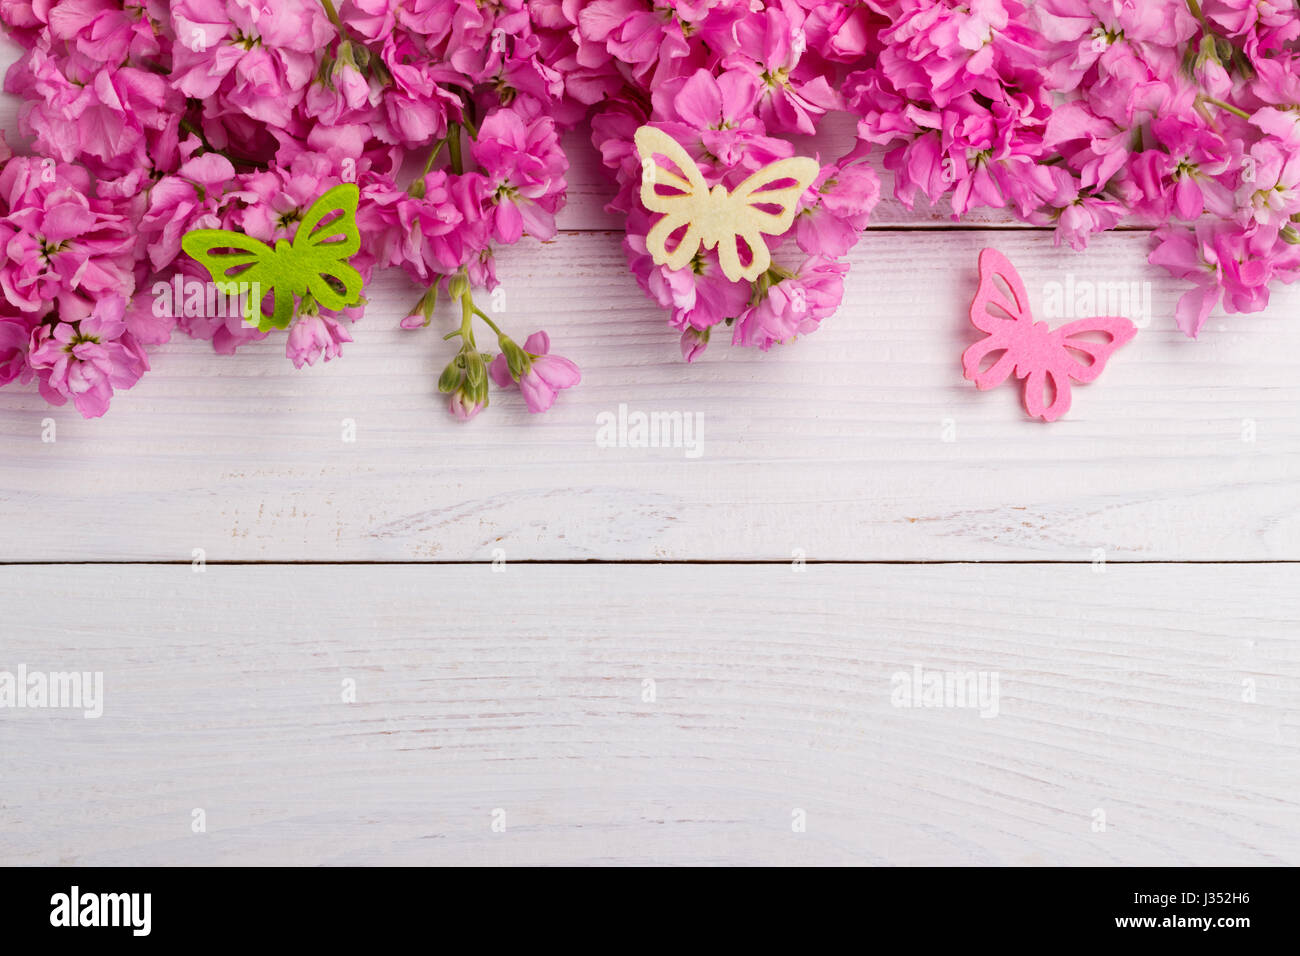 Matthiola incana stock photos matthiola incana stock images alamy fragrant pink stock flowers matthiola over white wooden background stock image mightylinksfo Gallery